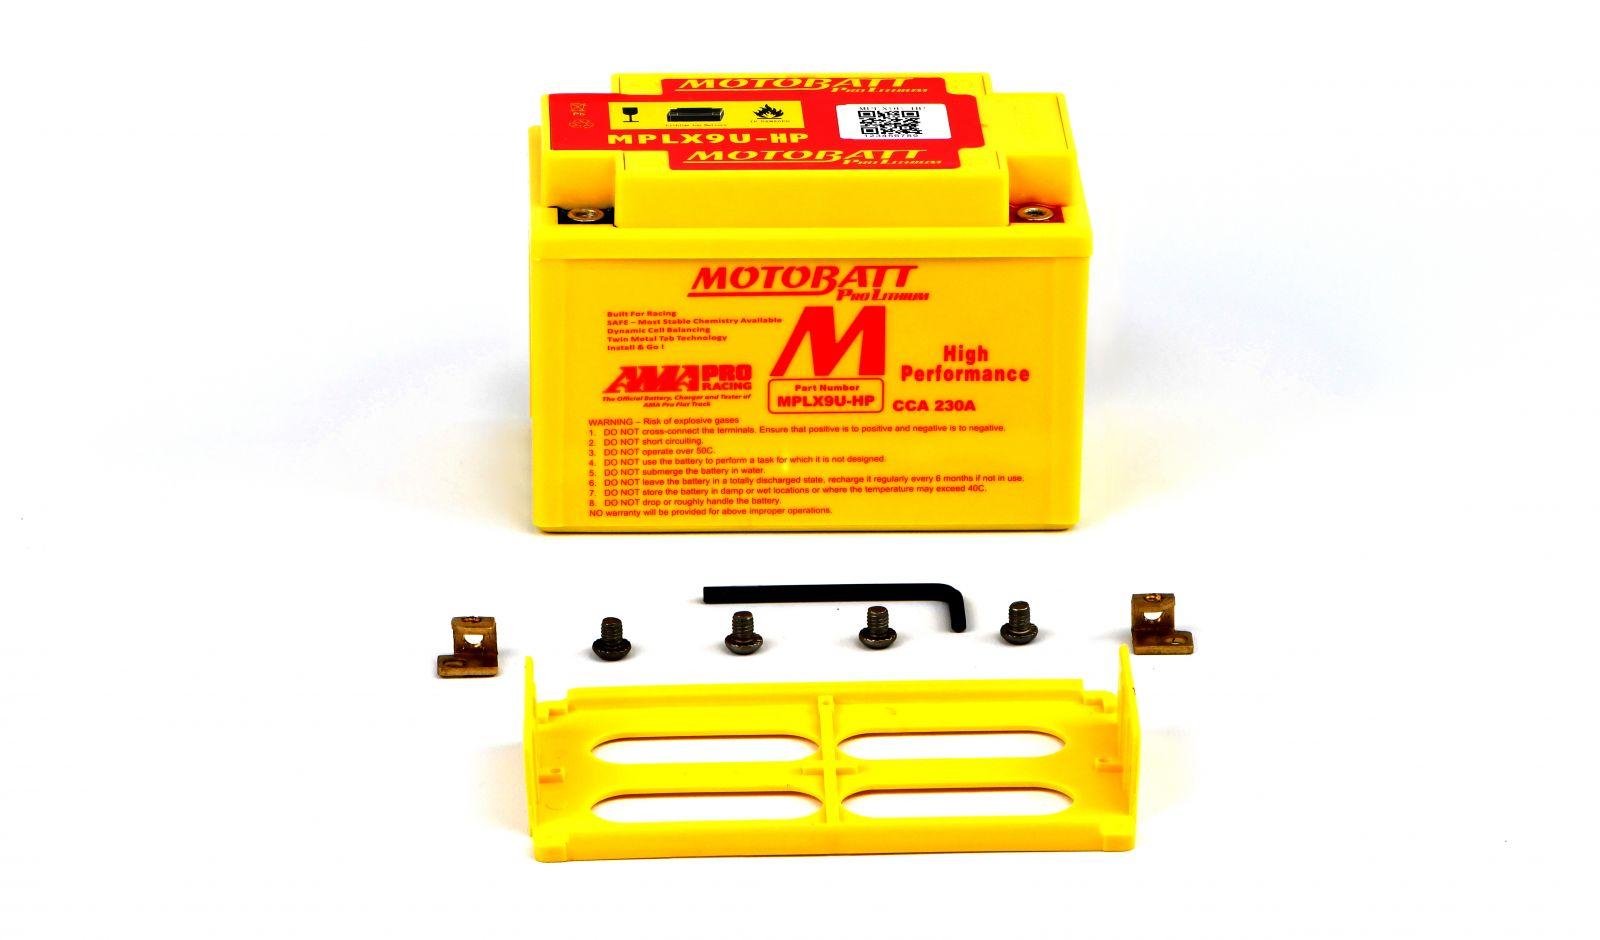 Motobatt Lithium Batteries - 501095MR image